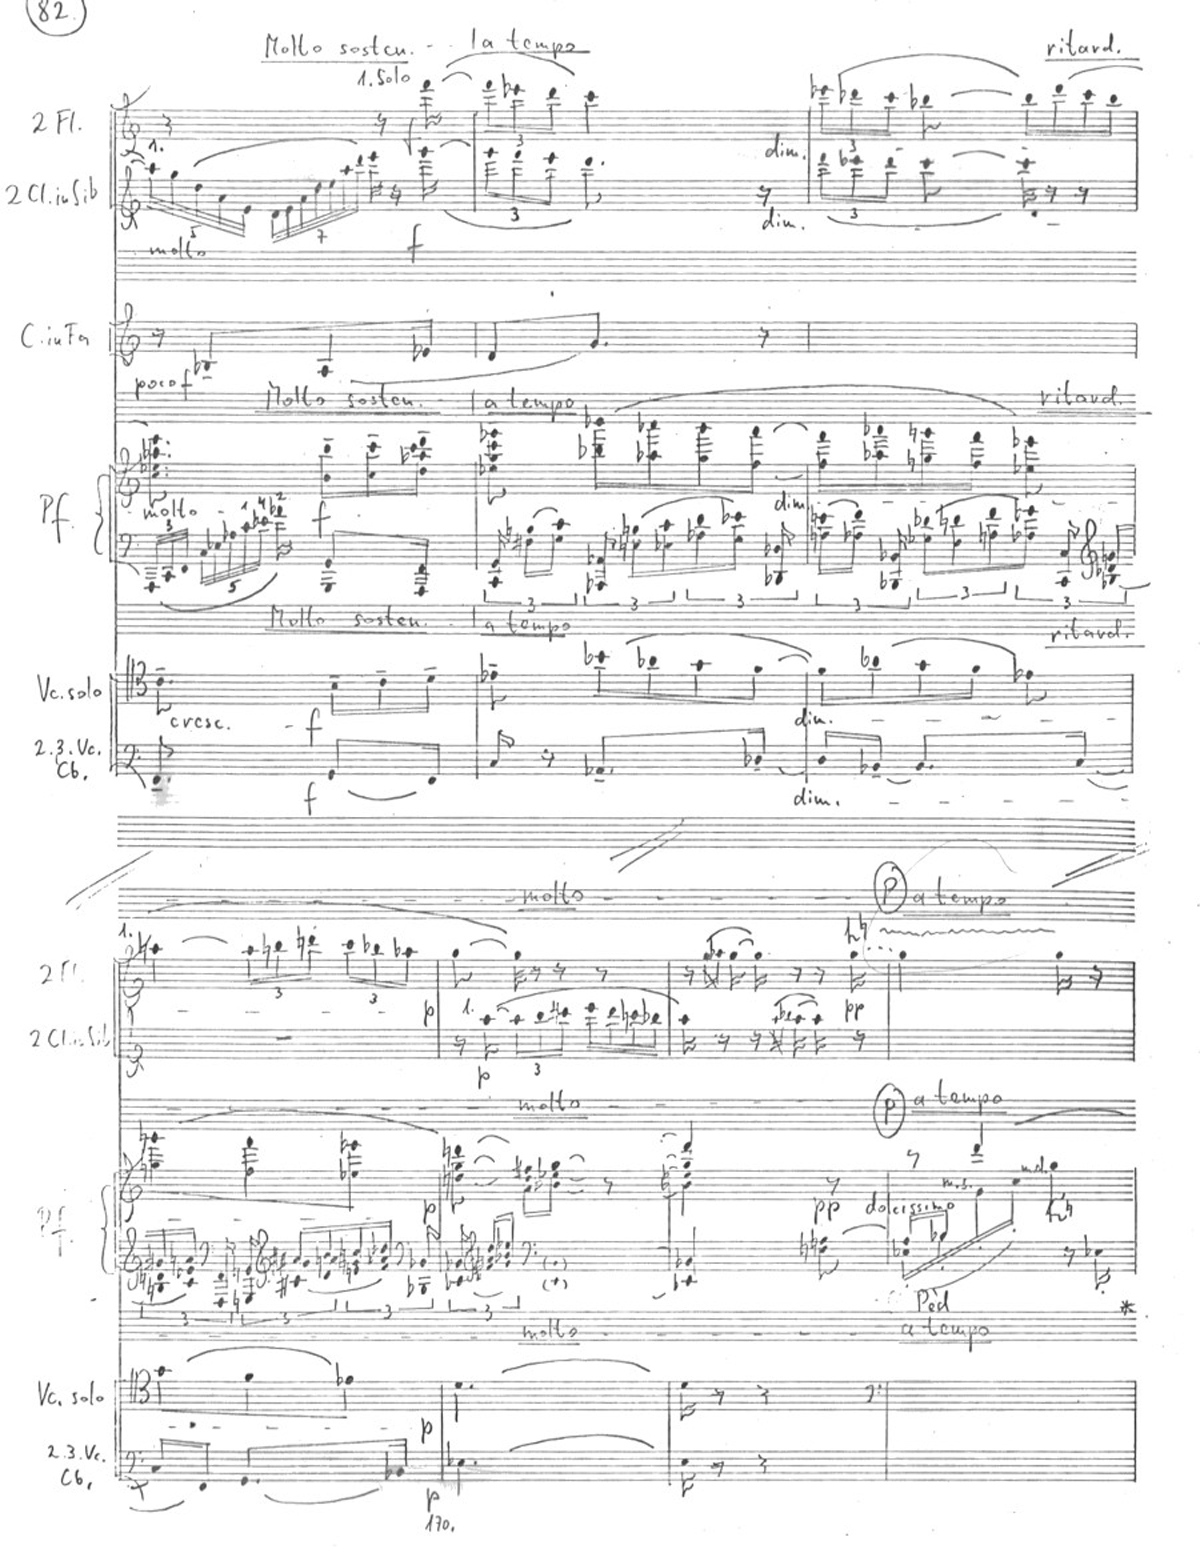 Ivan Eröd, Manuskript - Klavierkonzert Op. 19 / © Musikverlag Doblinger, abgebildet mit freundicher Genehmigung des Verlages